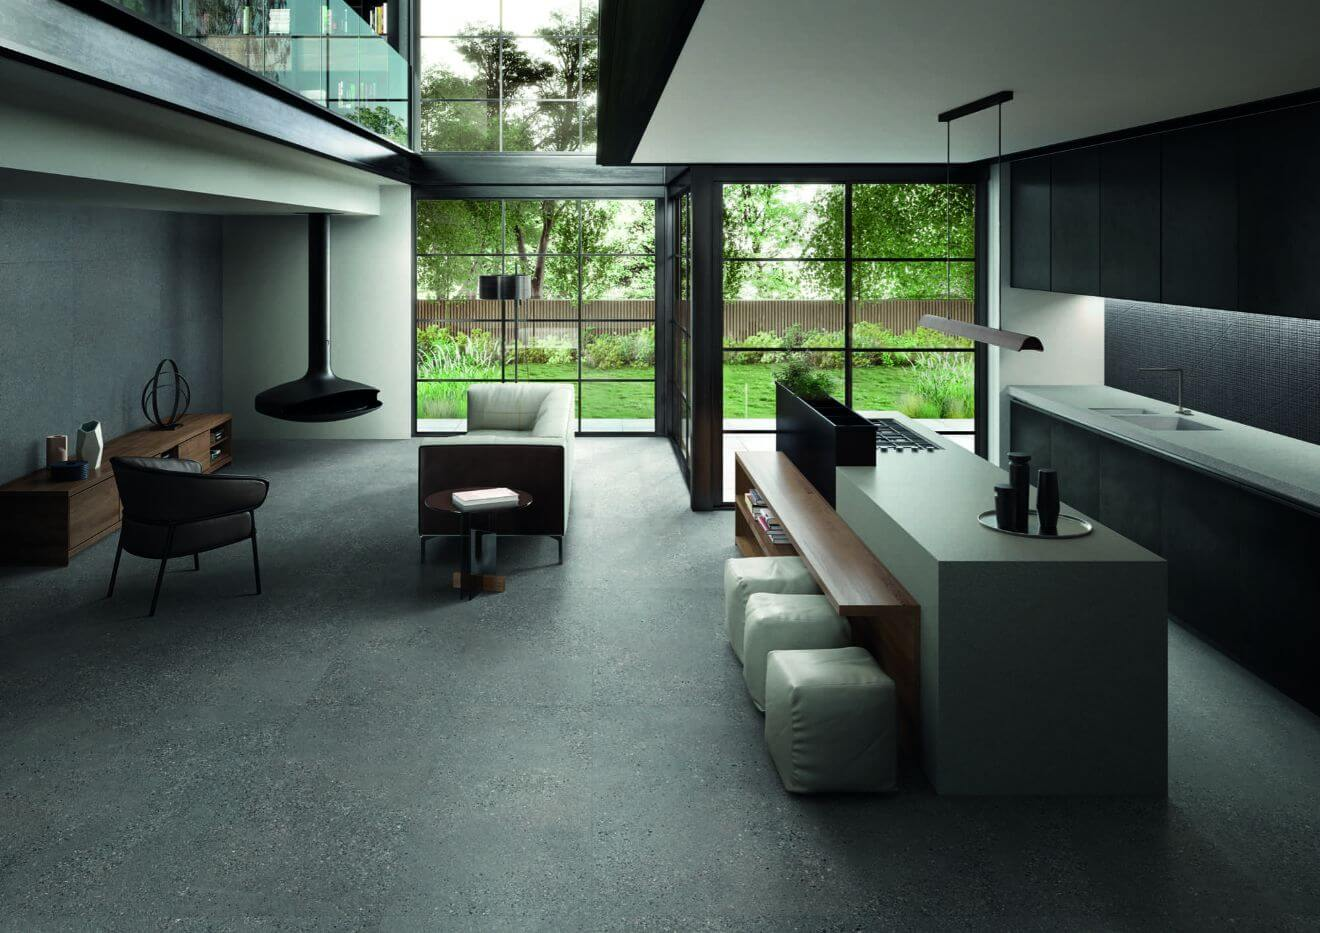 Vloertegels betonlook 90x90 cm - Grainstone Fine Dark - Naturale